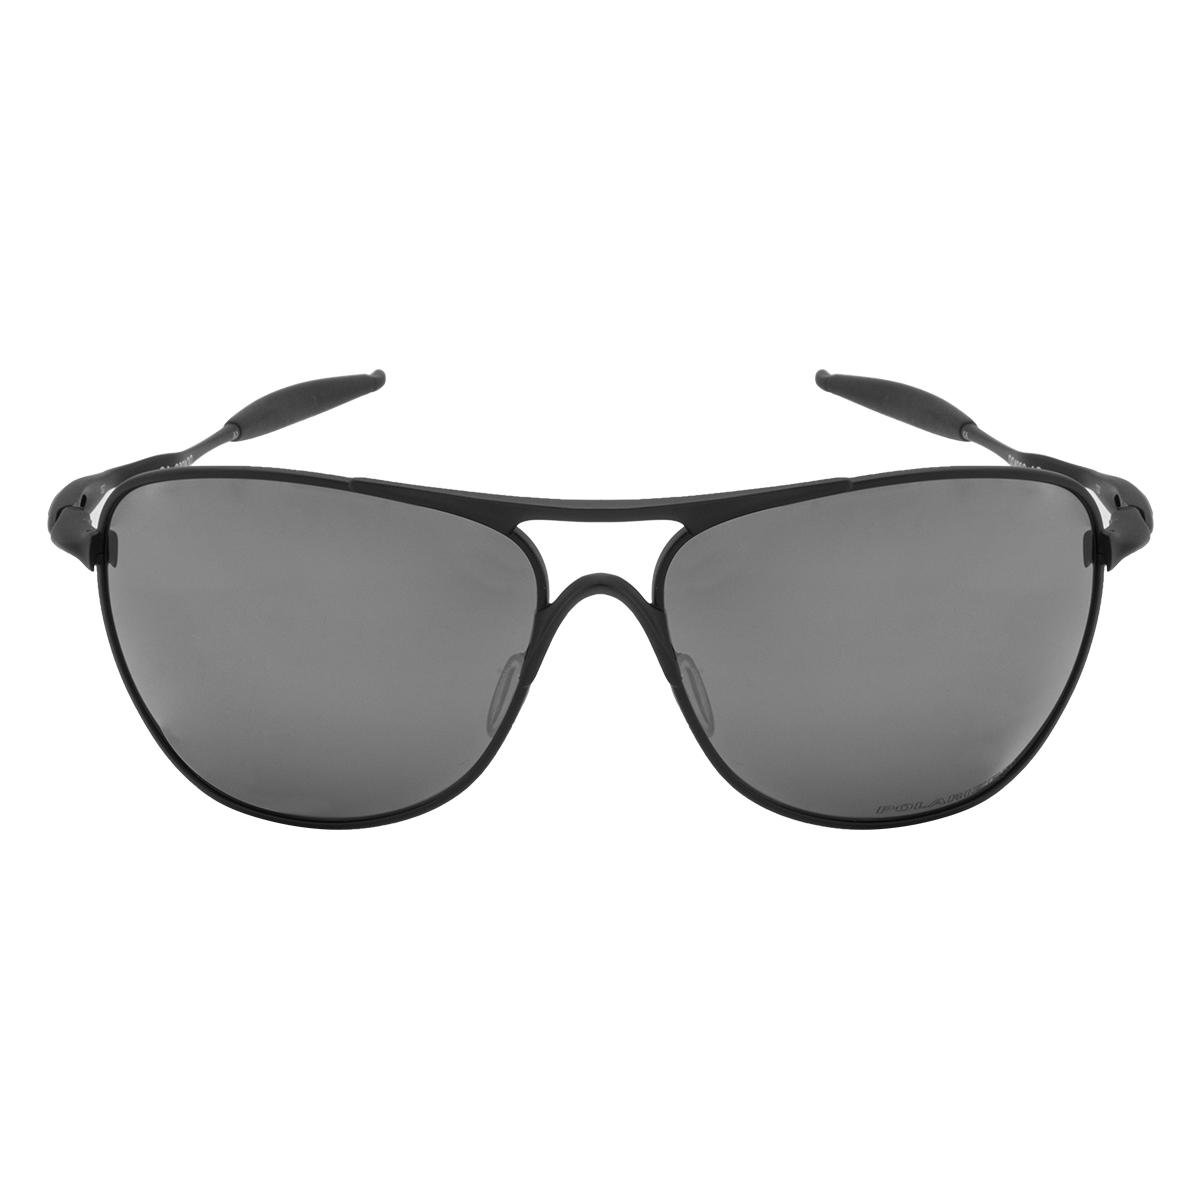 Óculos de Sol Oakley Crosshair Matte Black   Black Iridium Polarized -  10 61 ... 6e17d613e3